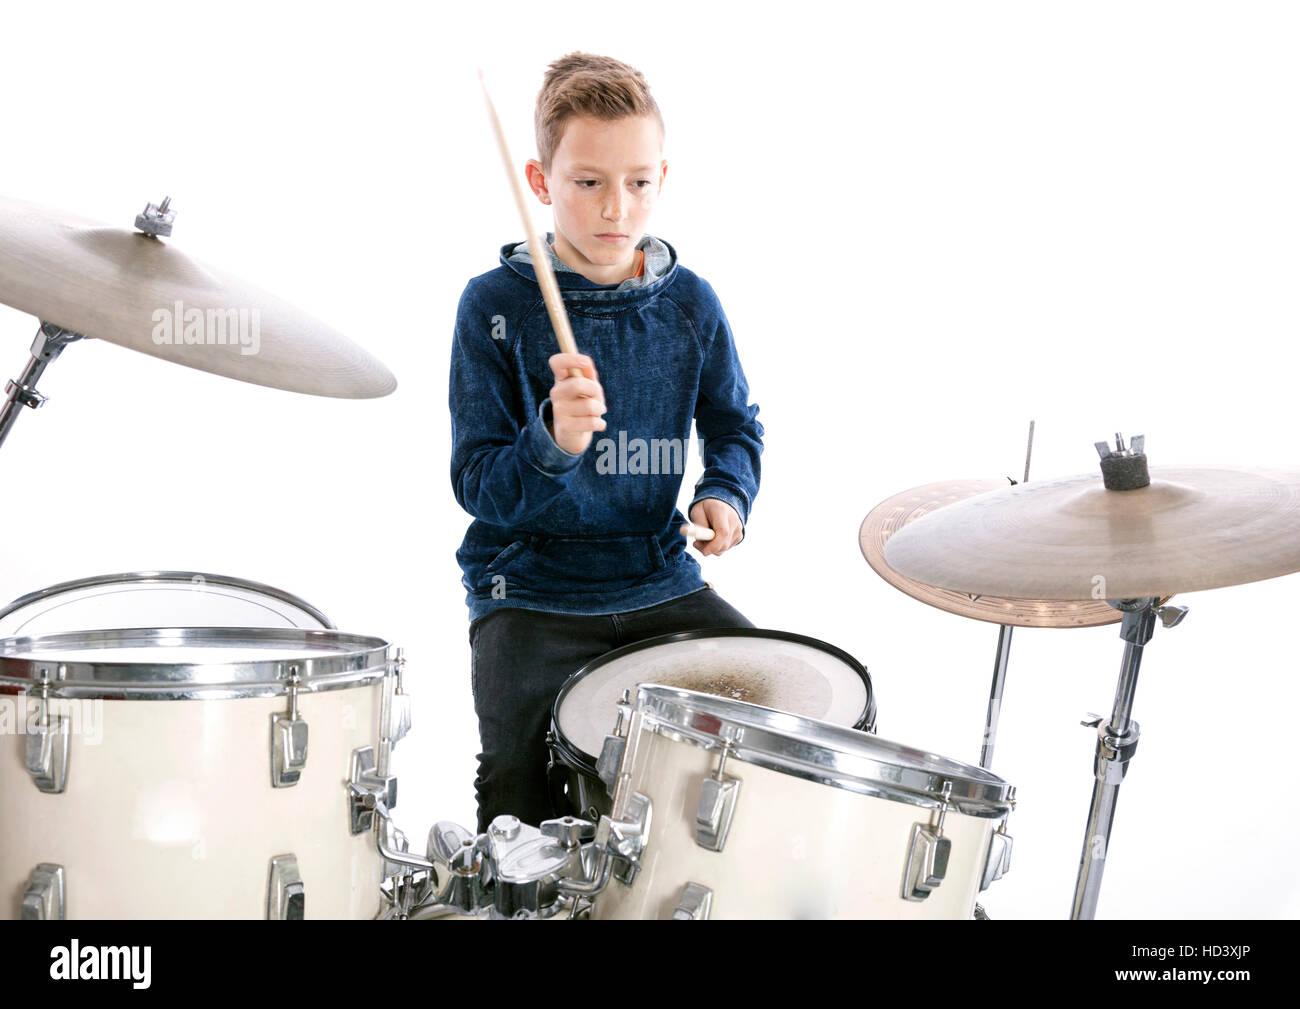 teenage boy behind drum kit in studio against white background - Stock Image